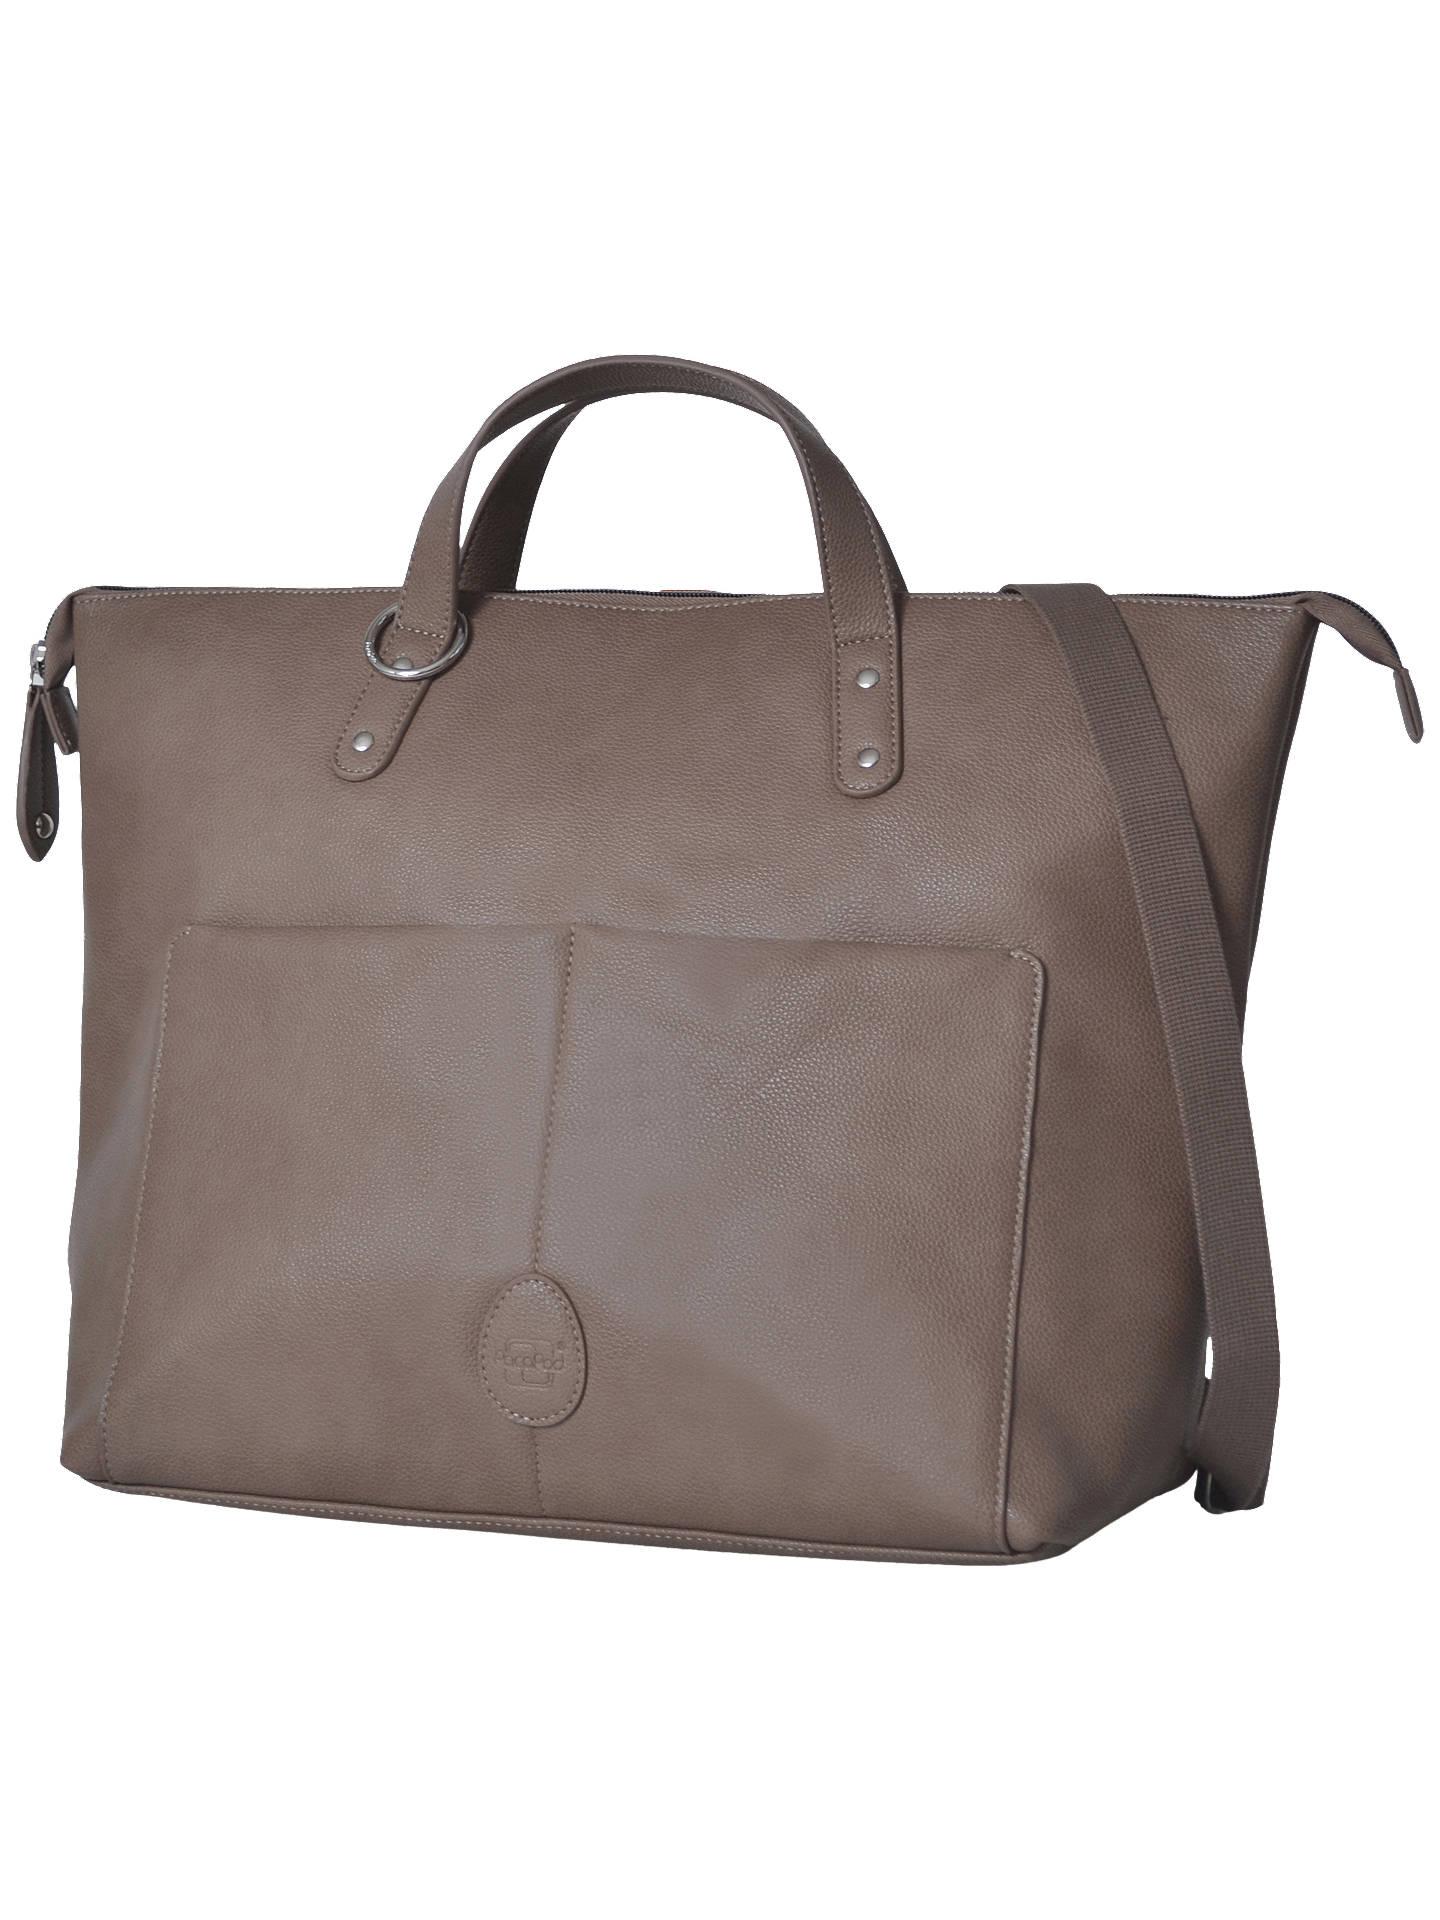 d9c366f6b3788 Buy PacaPod Saunton Changing Bag, Latte Online at johnlewis.com ...